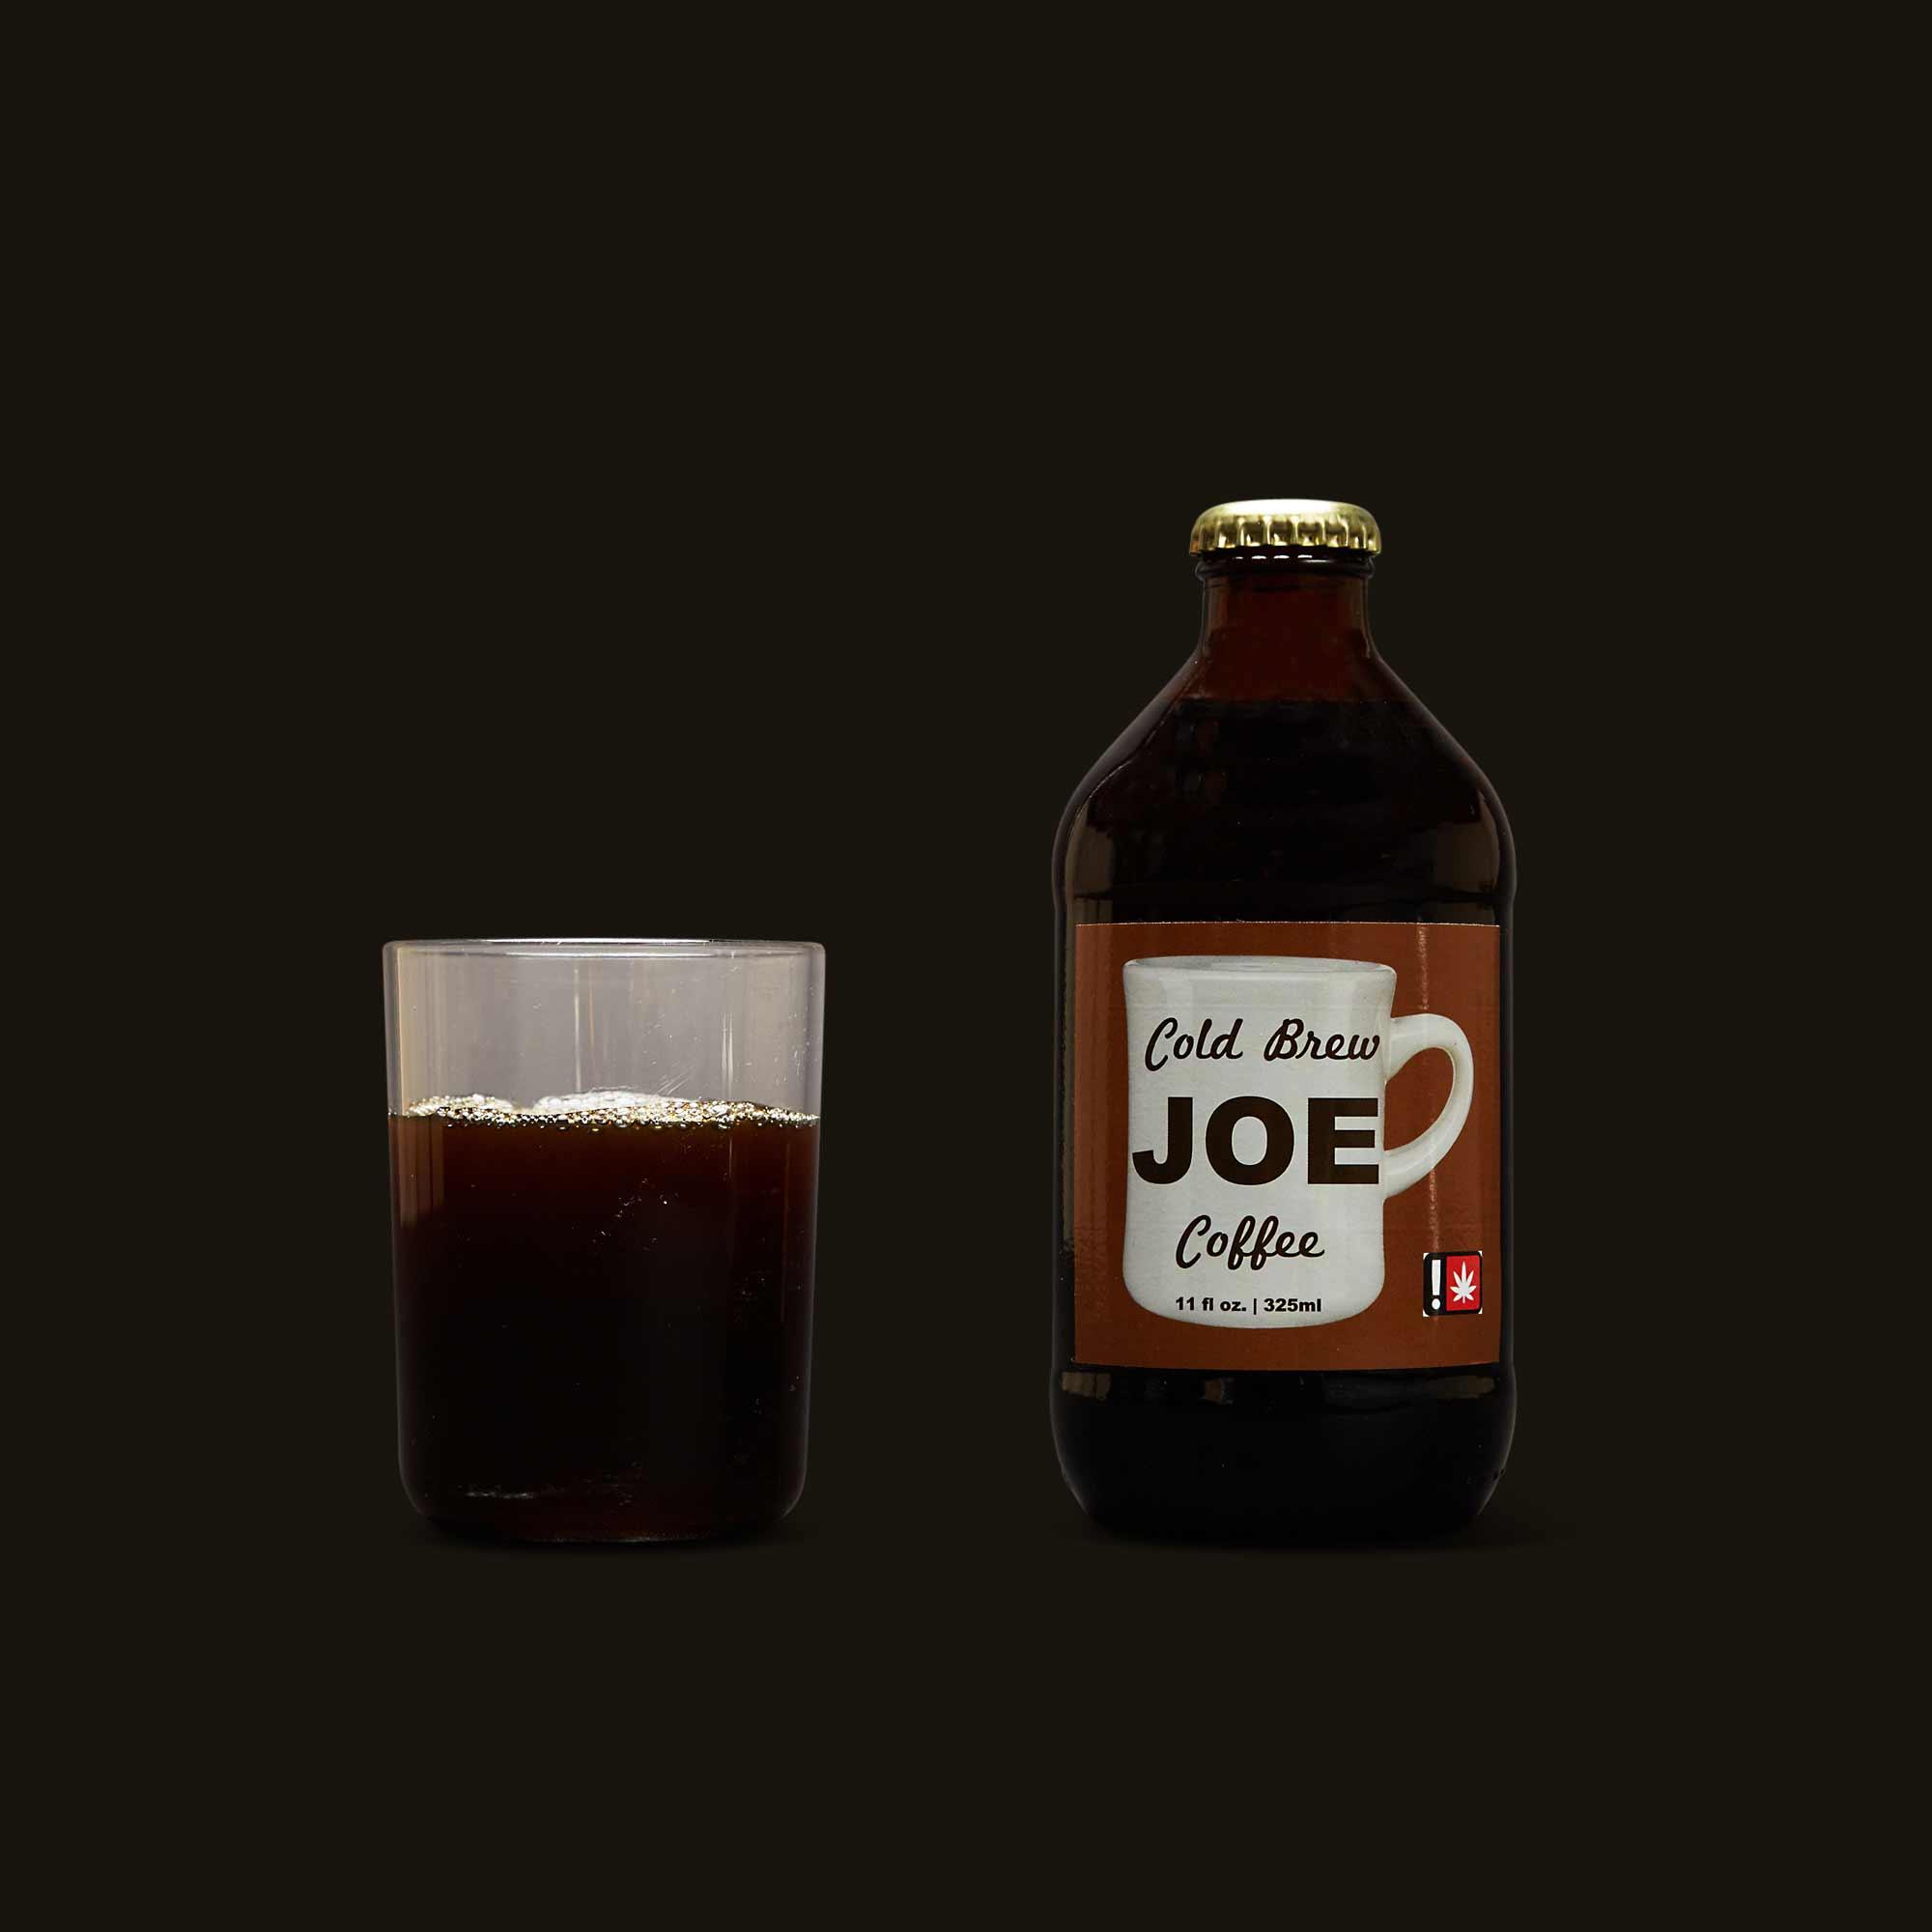 Med with Love Cold Brew Joe - CBD